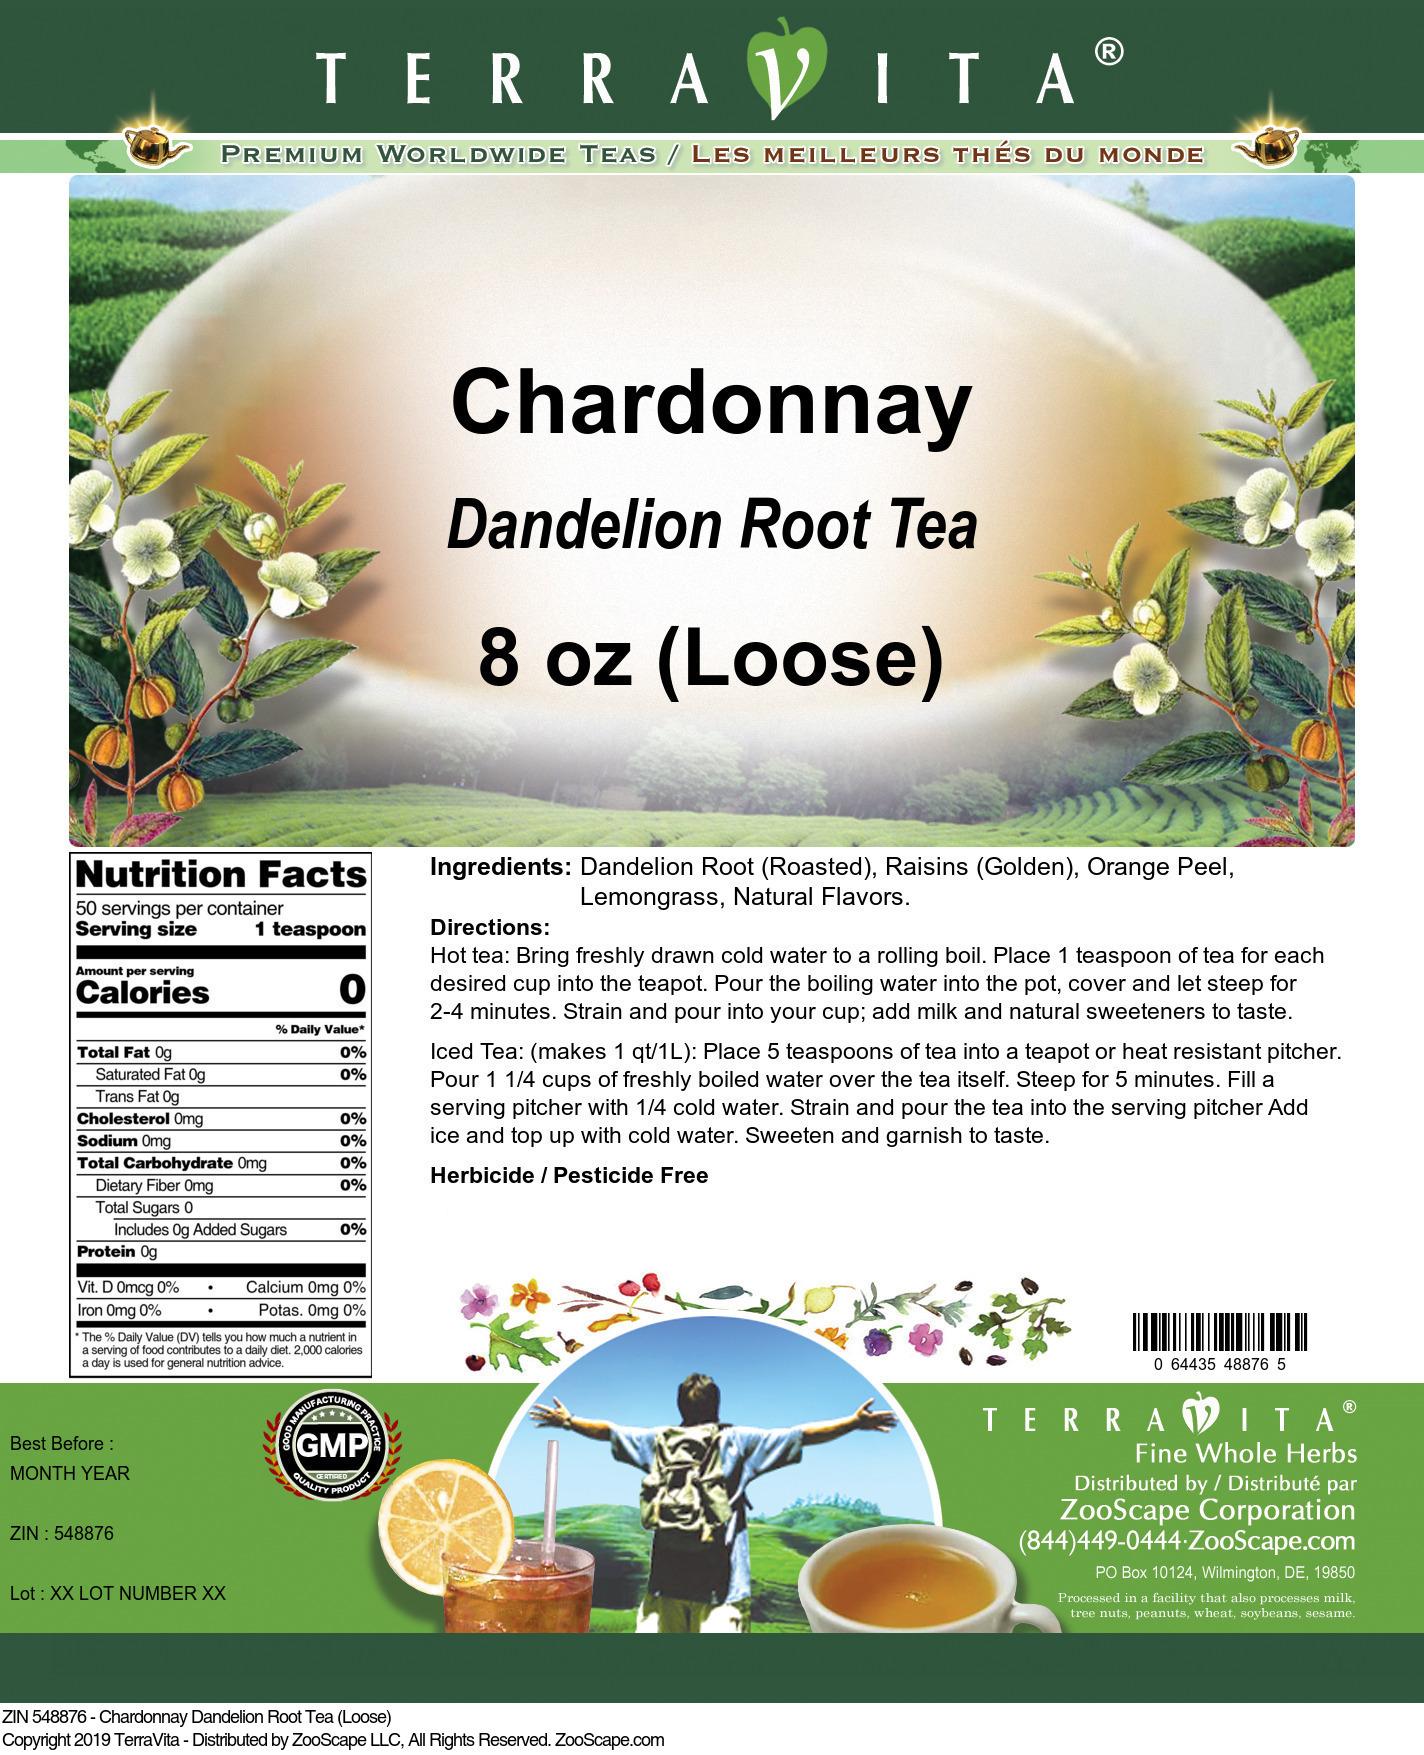 Chardonnay Dandelion Root Tea (Loose)